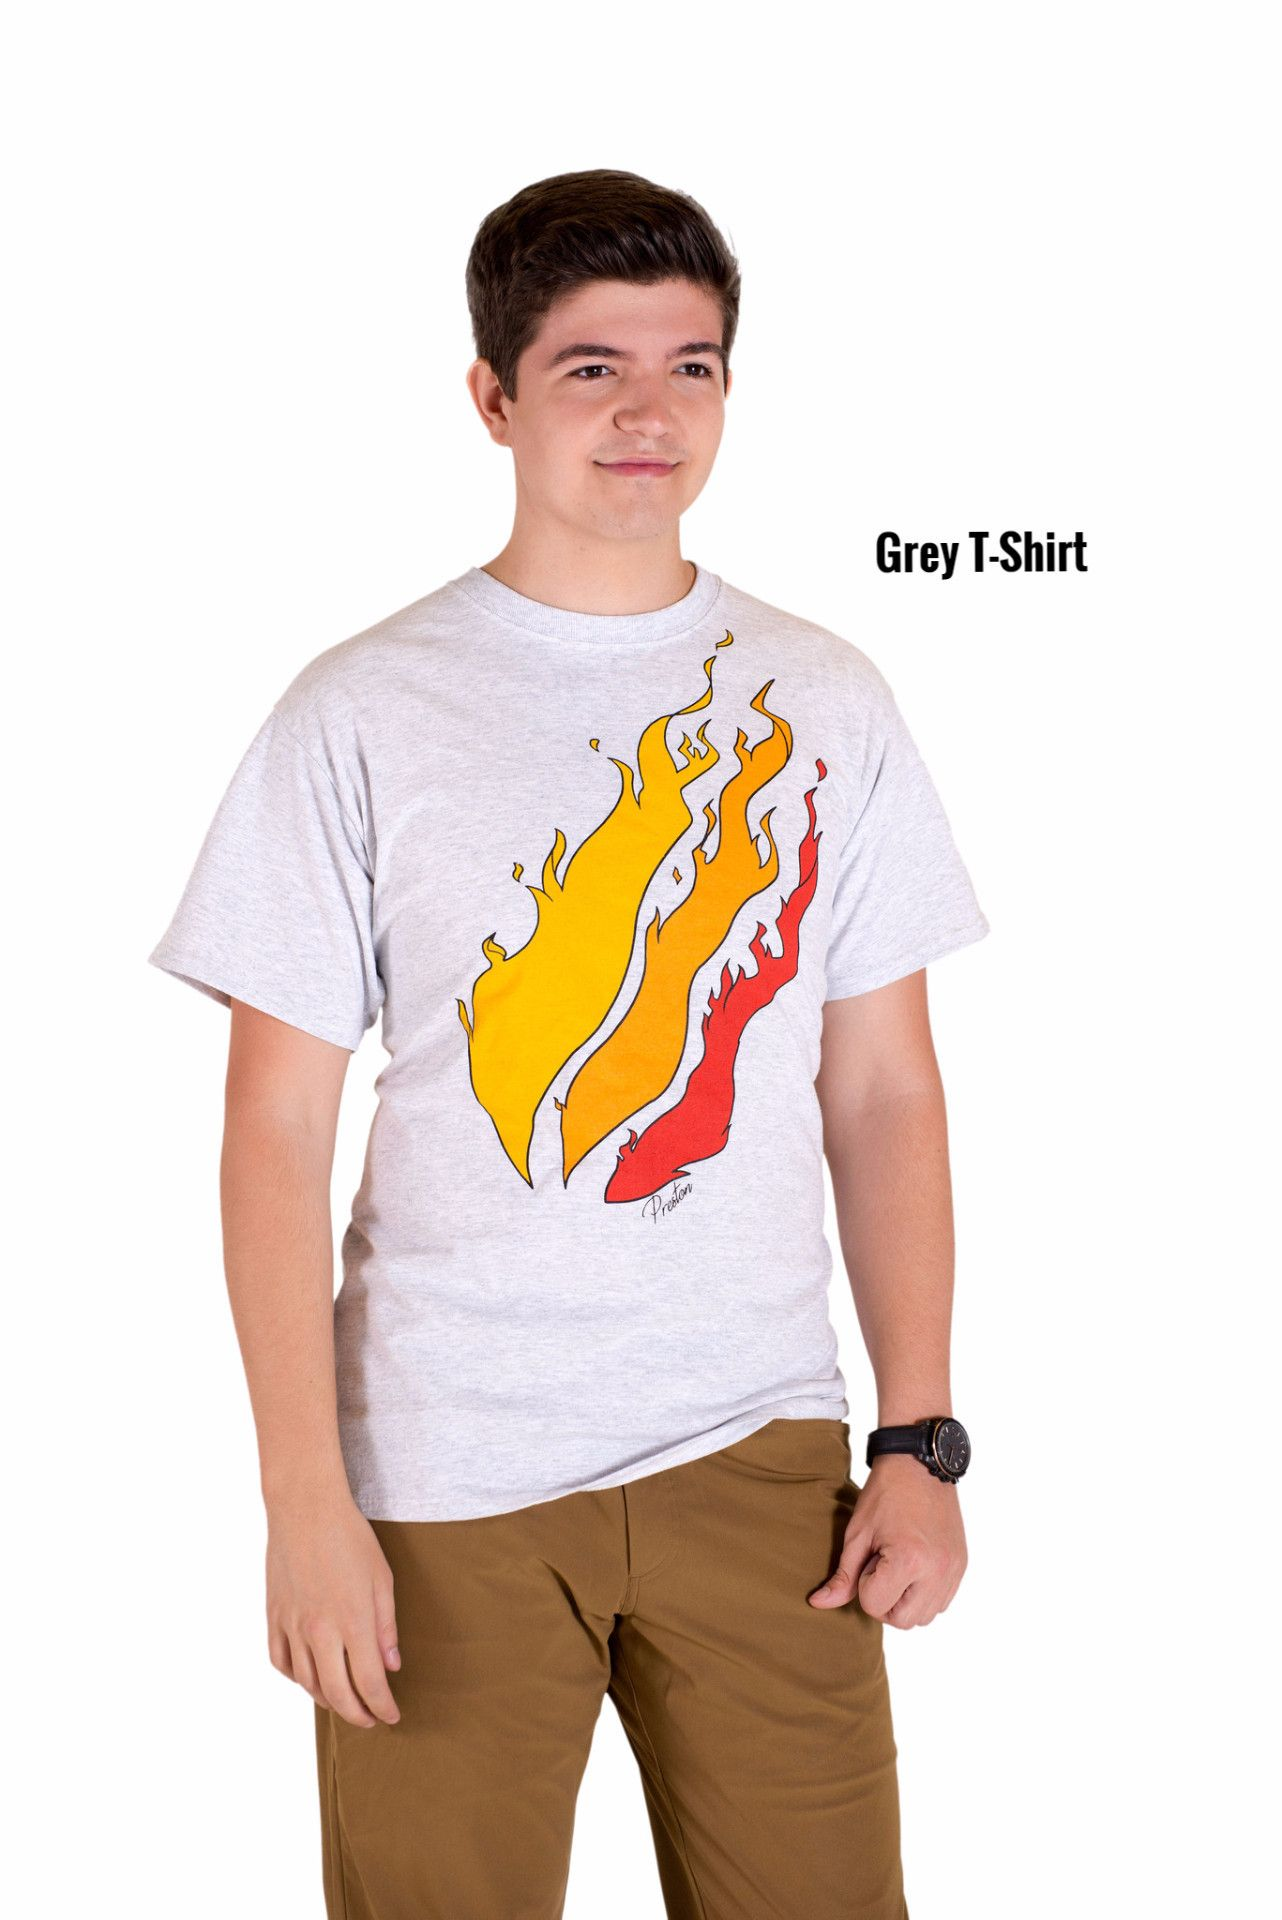 """Fire"" TShirts (White/Black/Gray/Tan) Preston"